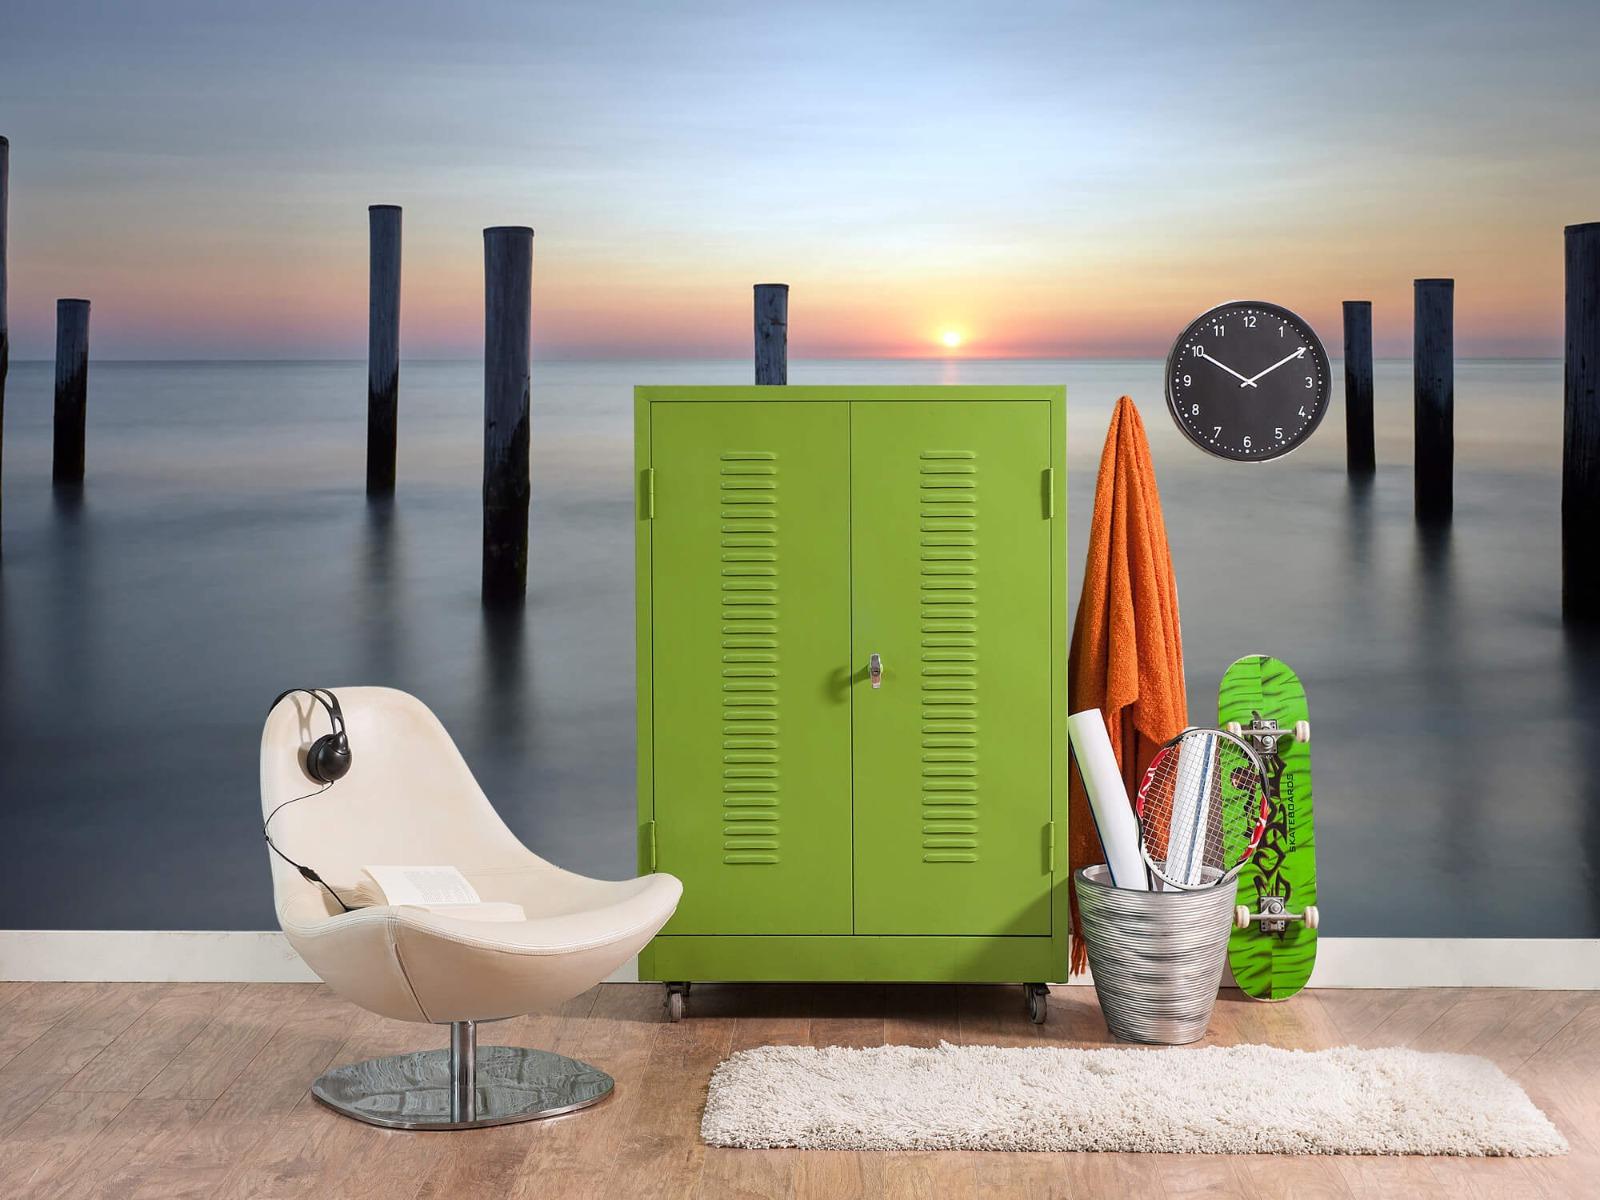 Zeeën en Oceanen - Strandpalen - Slaapkamer 20